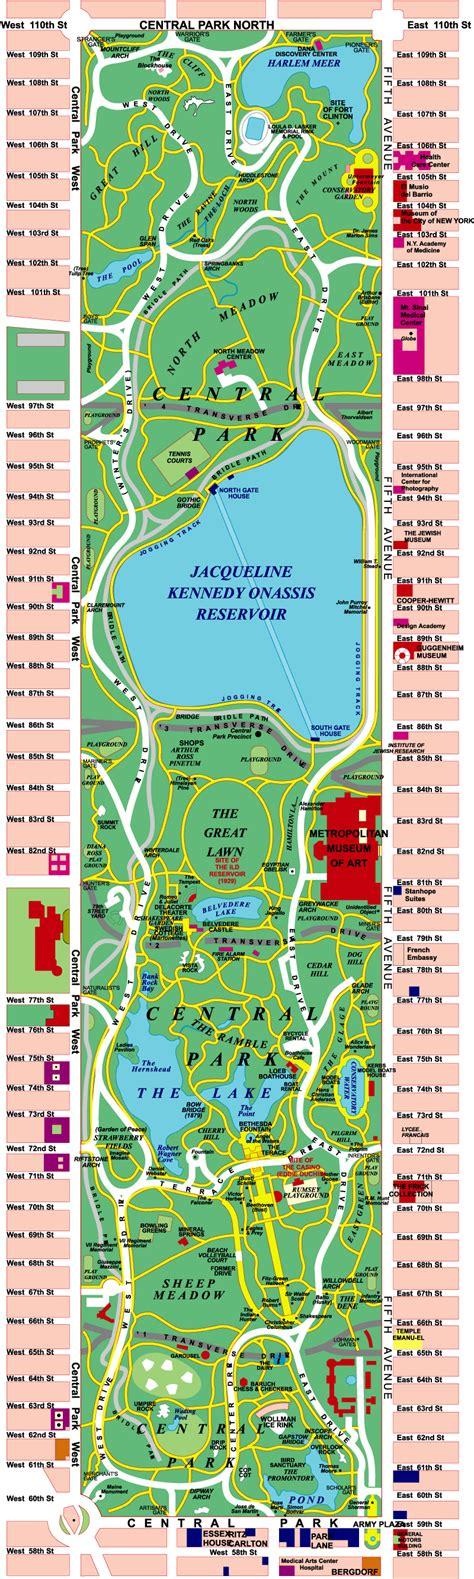 nyc parking map atr56 new york